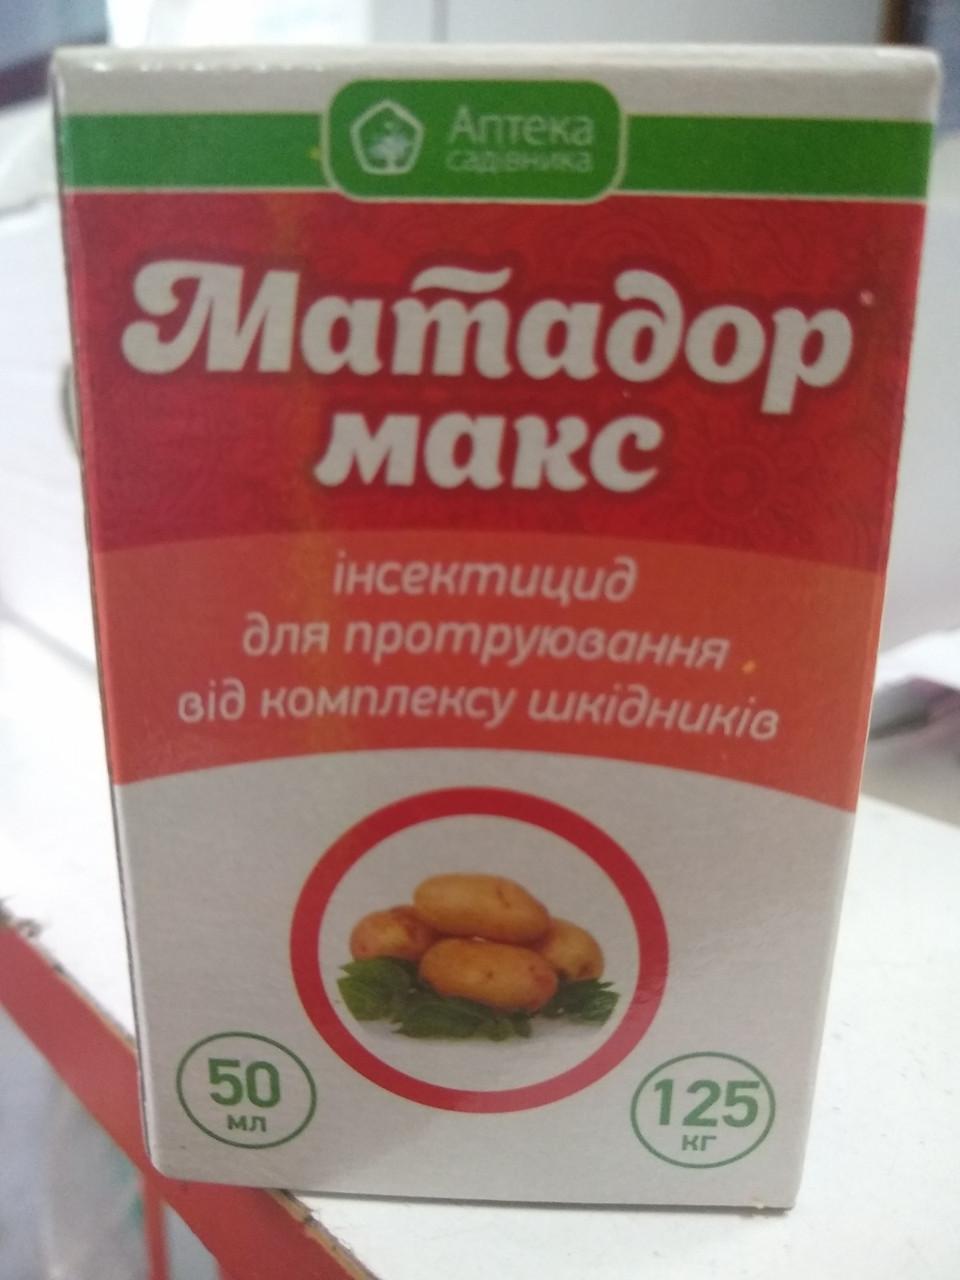 Матадор макс, инсектицид- протравитель от комплекса вредителей  50 мл, на 125 кг картофеля Украина